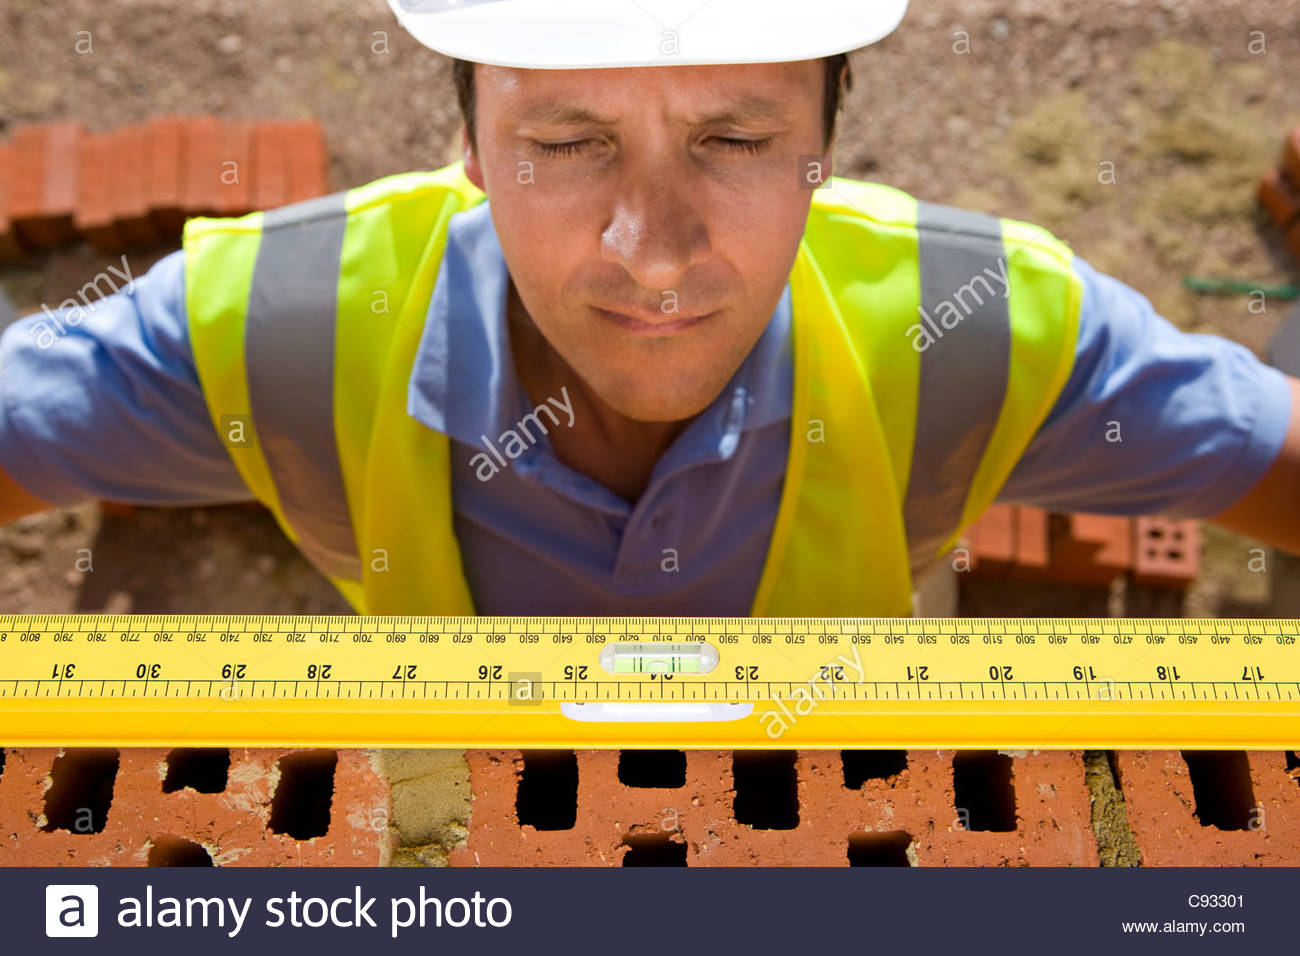 Close up of bricklayer holding carpenter rule along bricks on wall - Stock Image